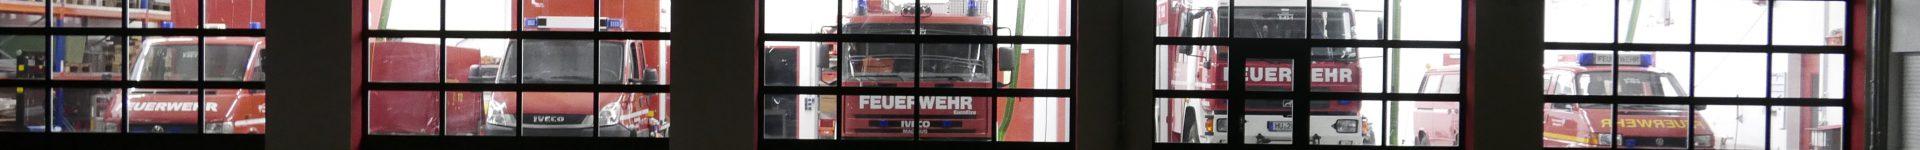 Kategorie: Brandschutztipps